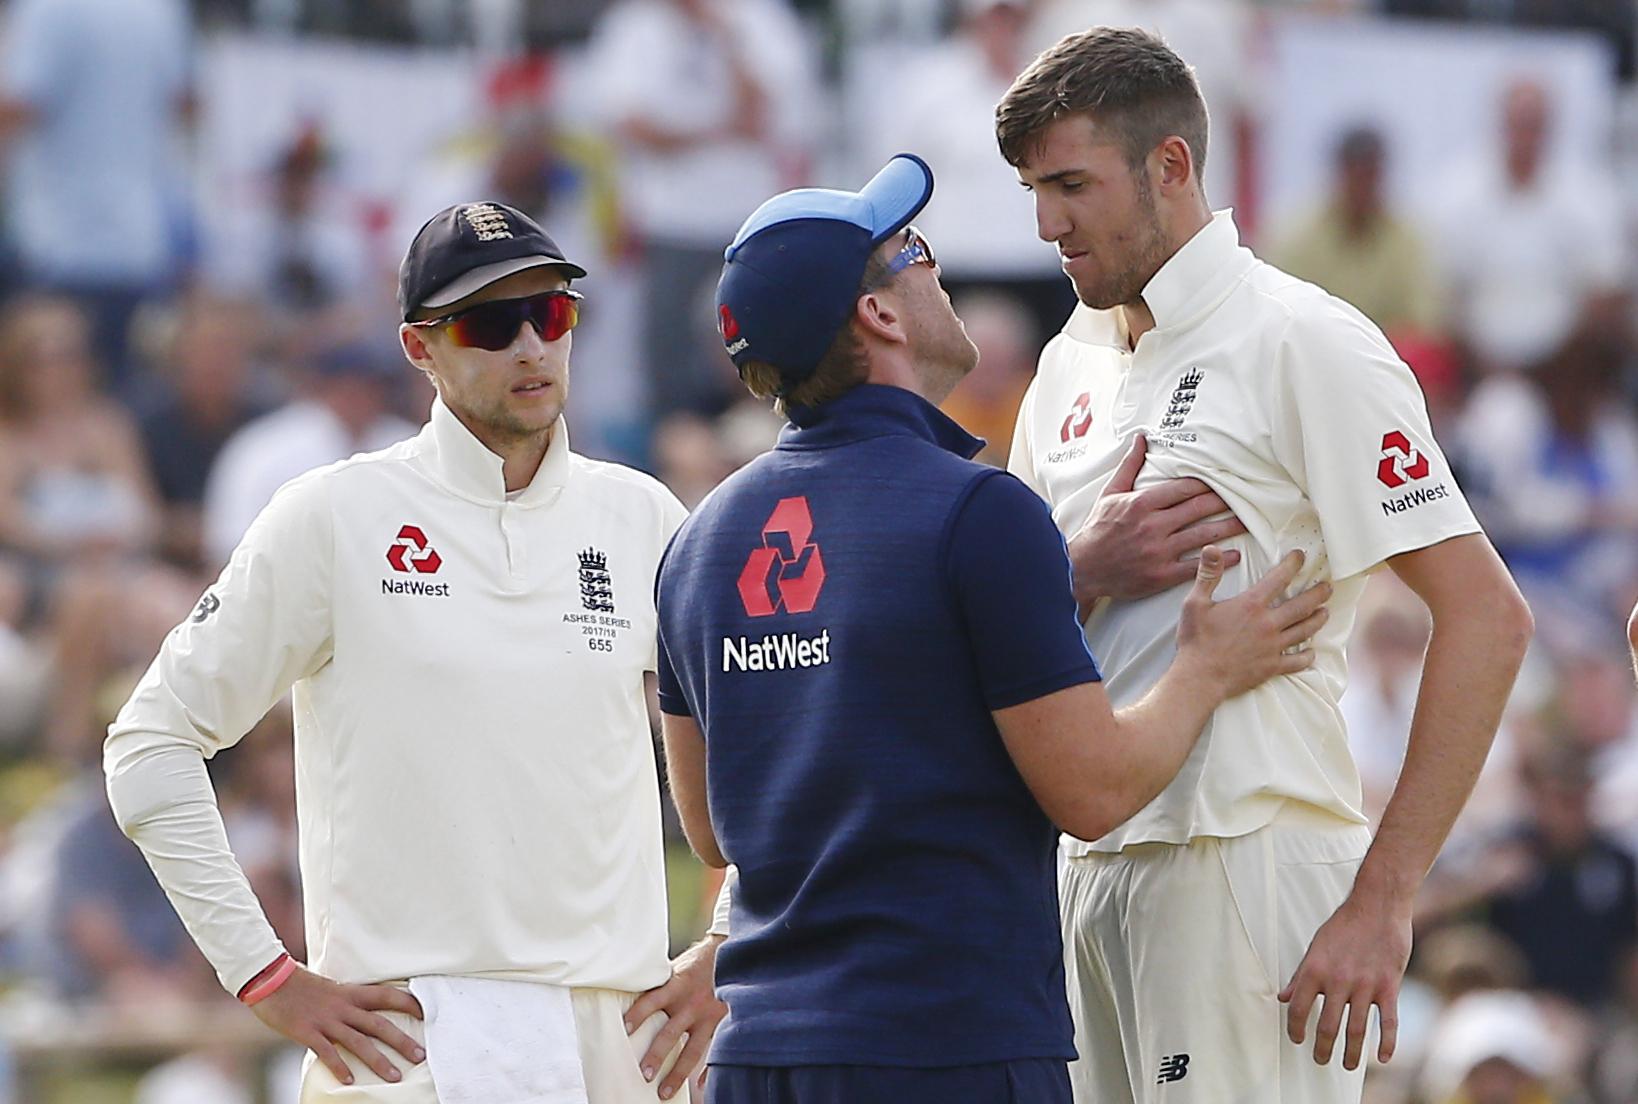 England's Jonny Bairstow celebrates Ashes Test century by head-butting helmet